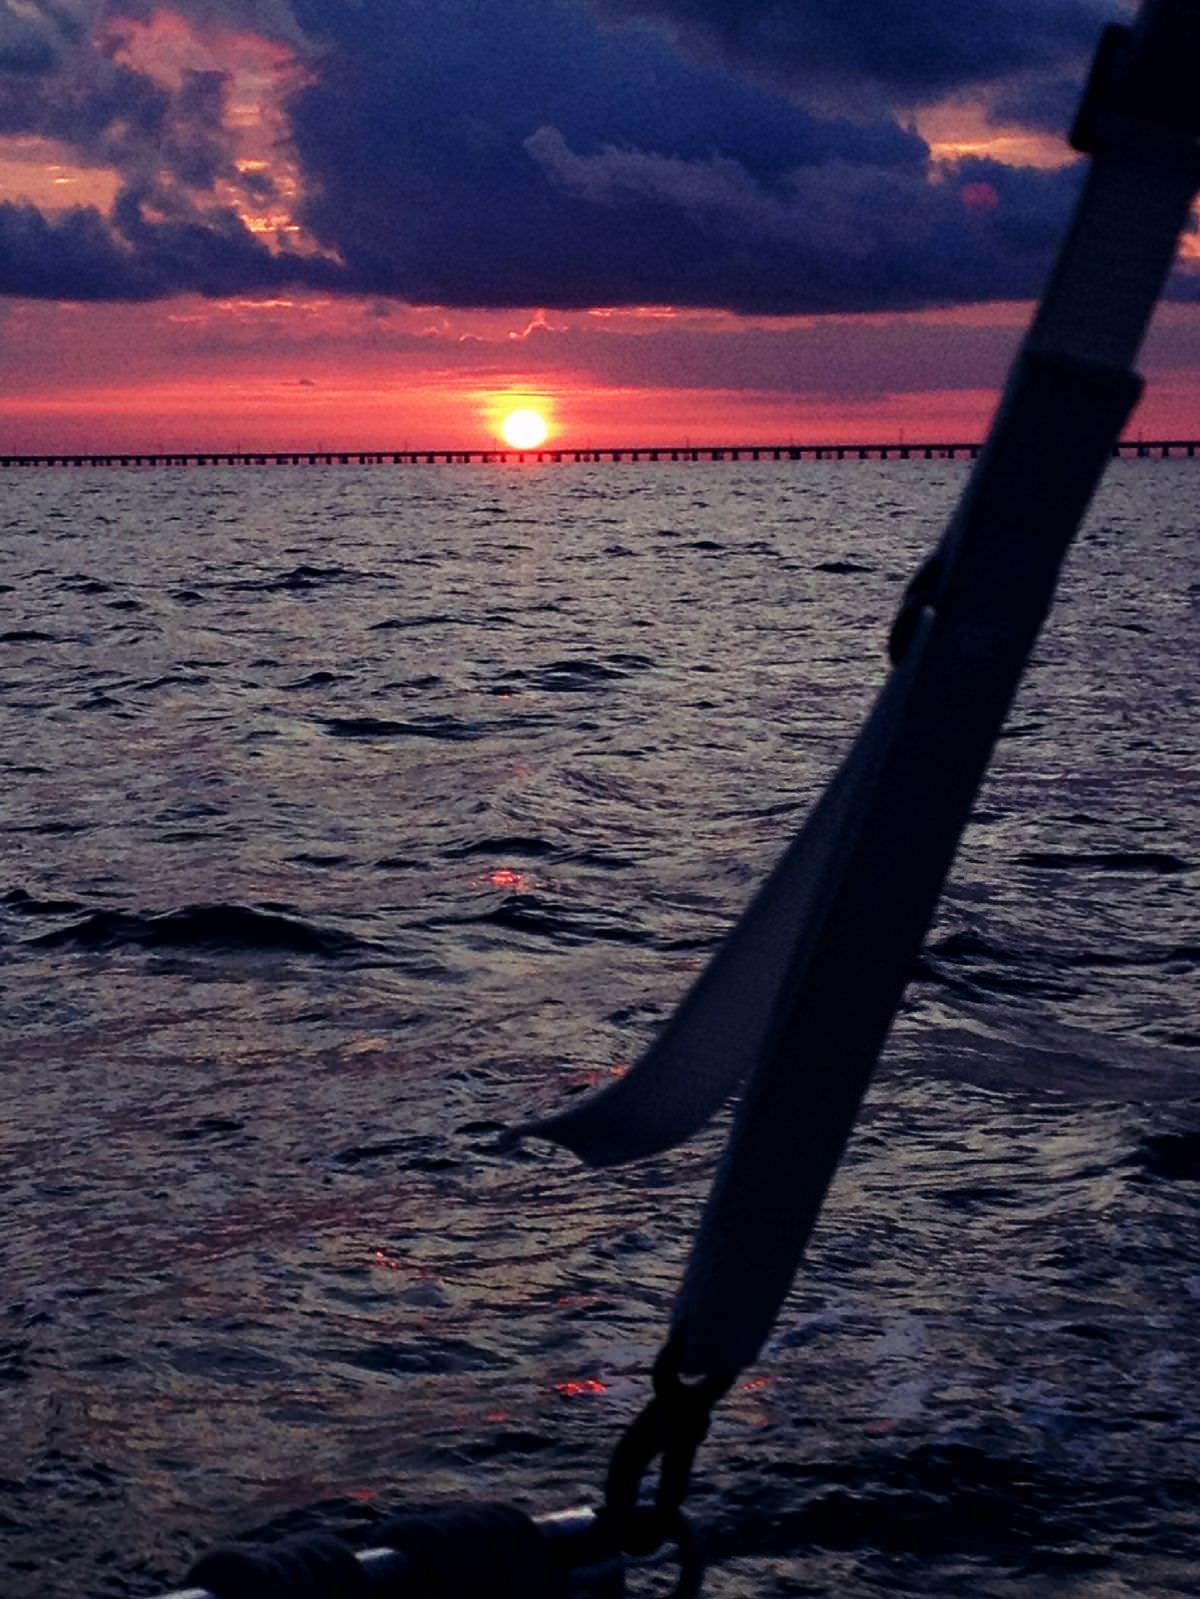 And beautiful sunsets